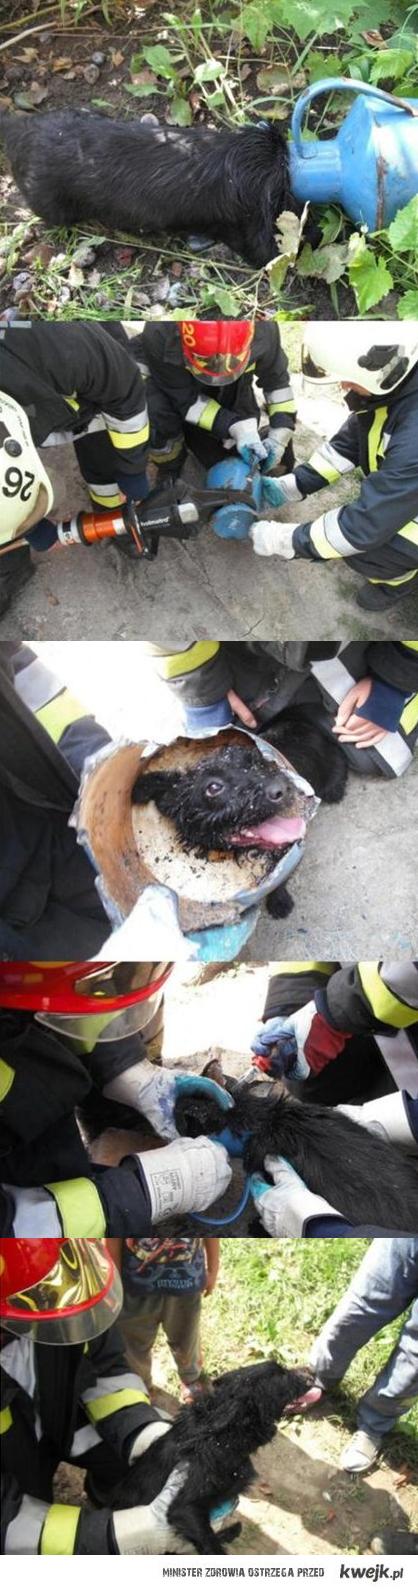 Pies, 112, Straż Pożarna